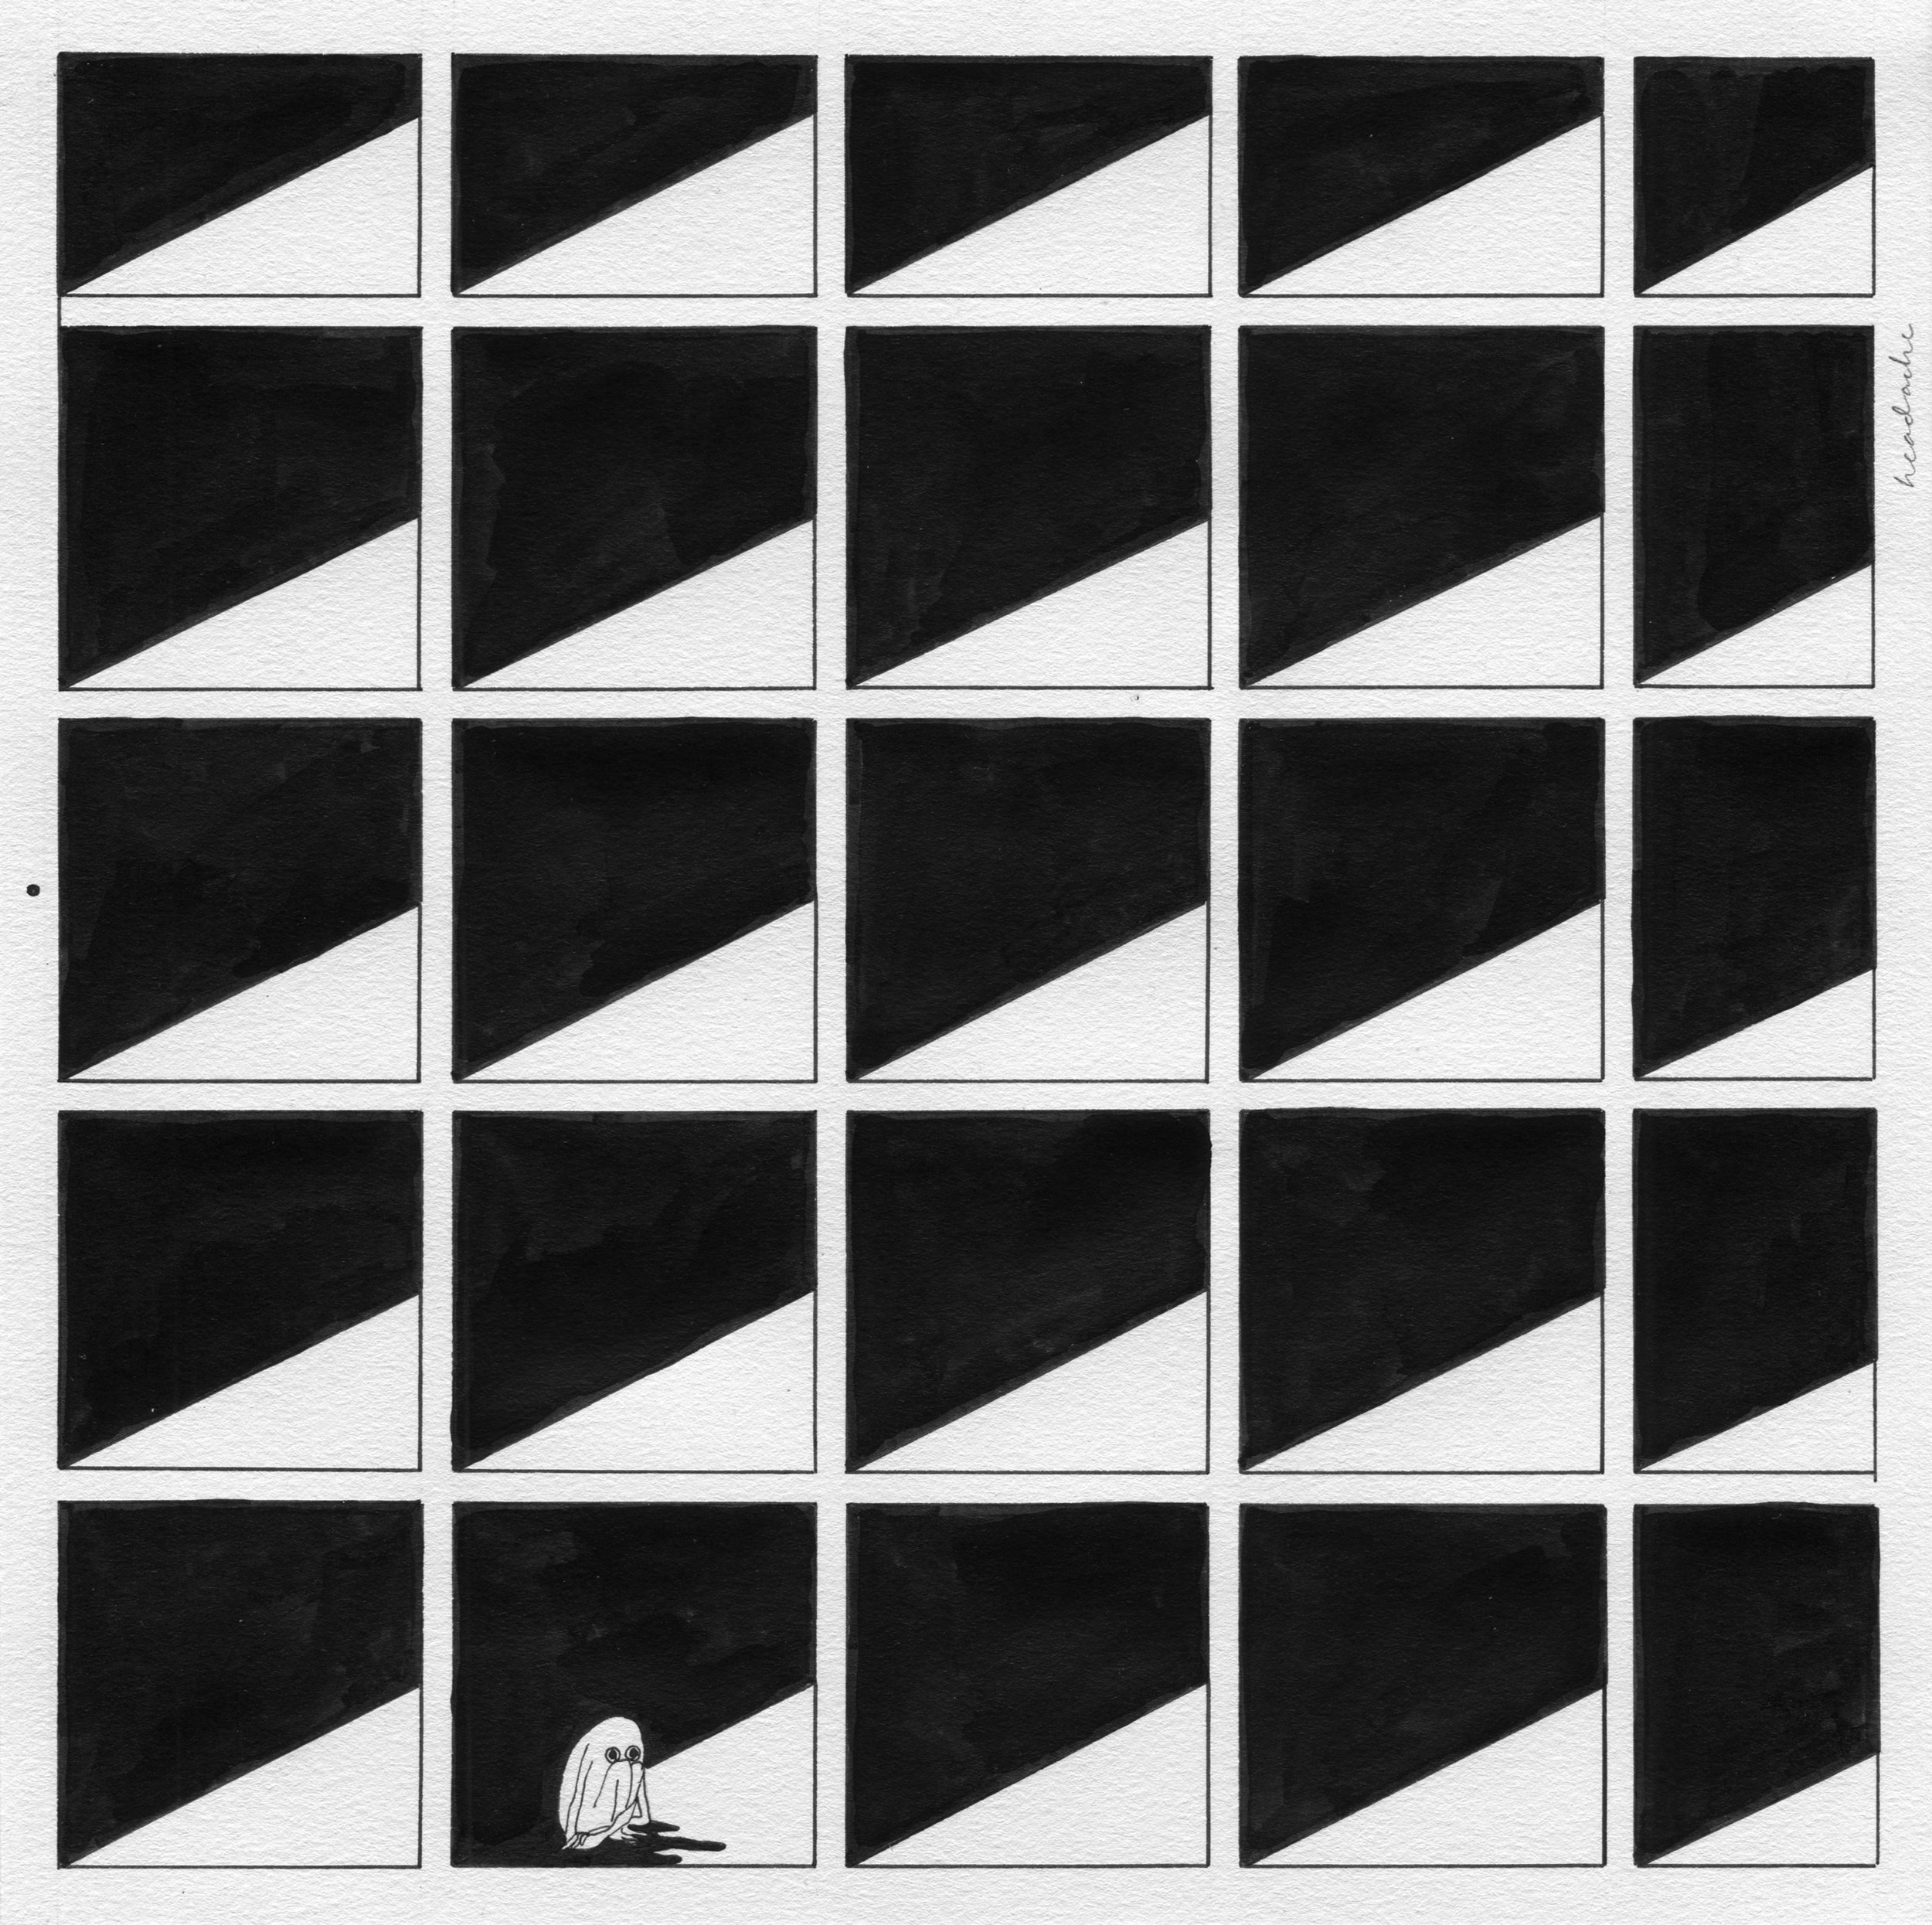 headache086-levels.jpg